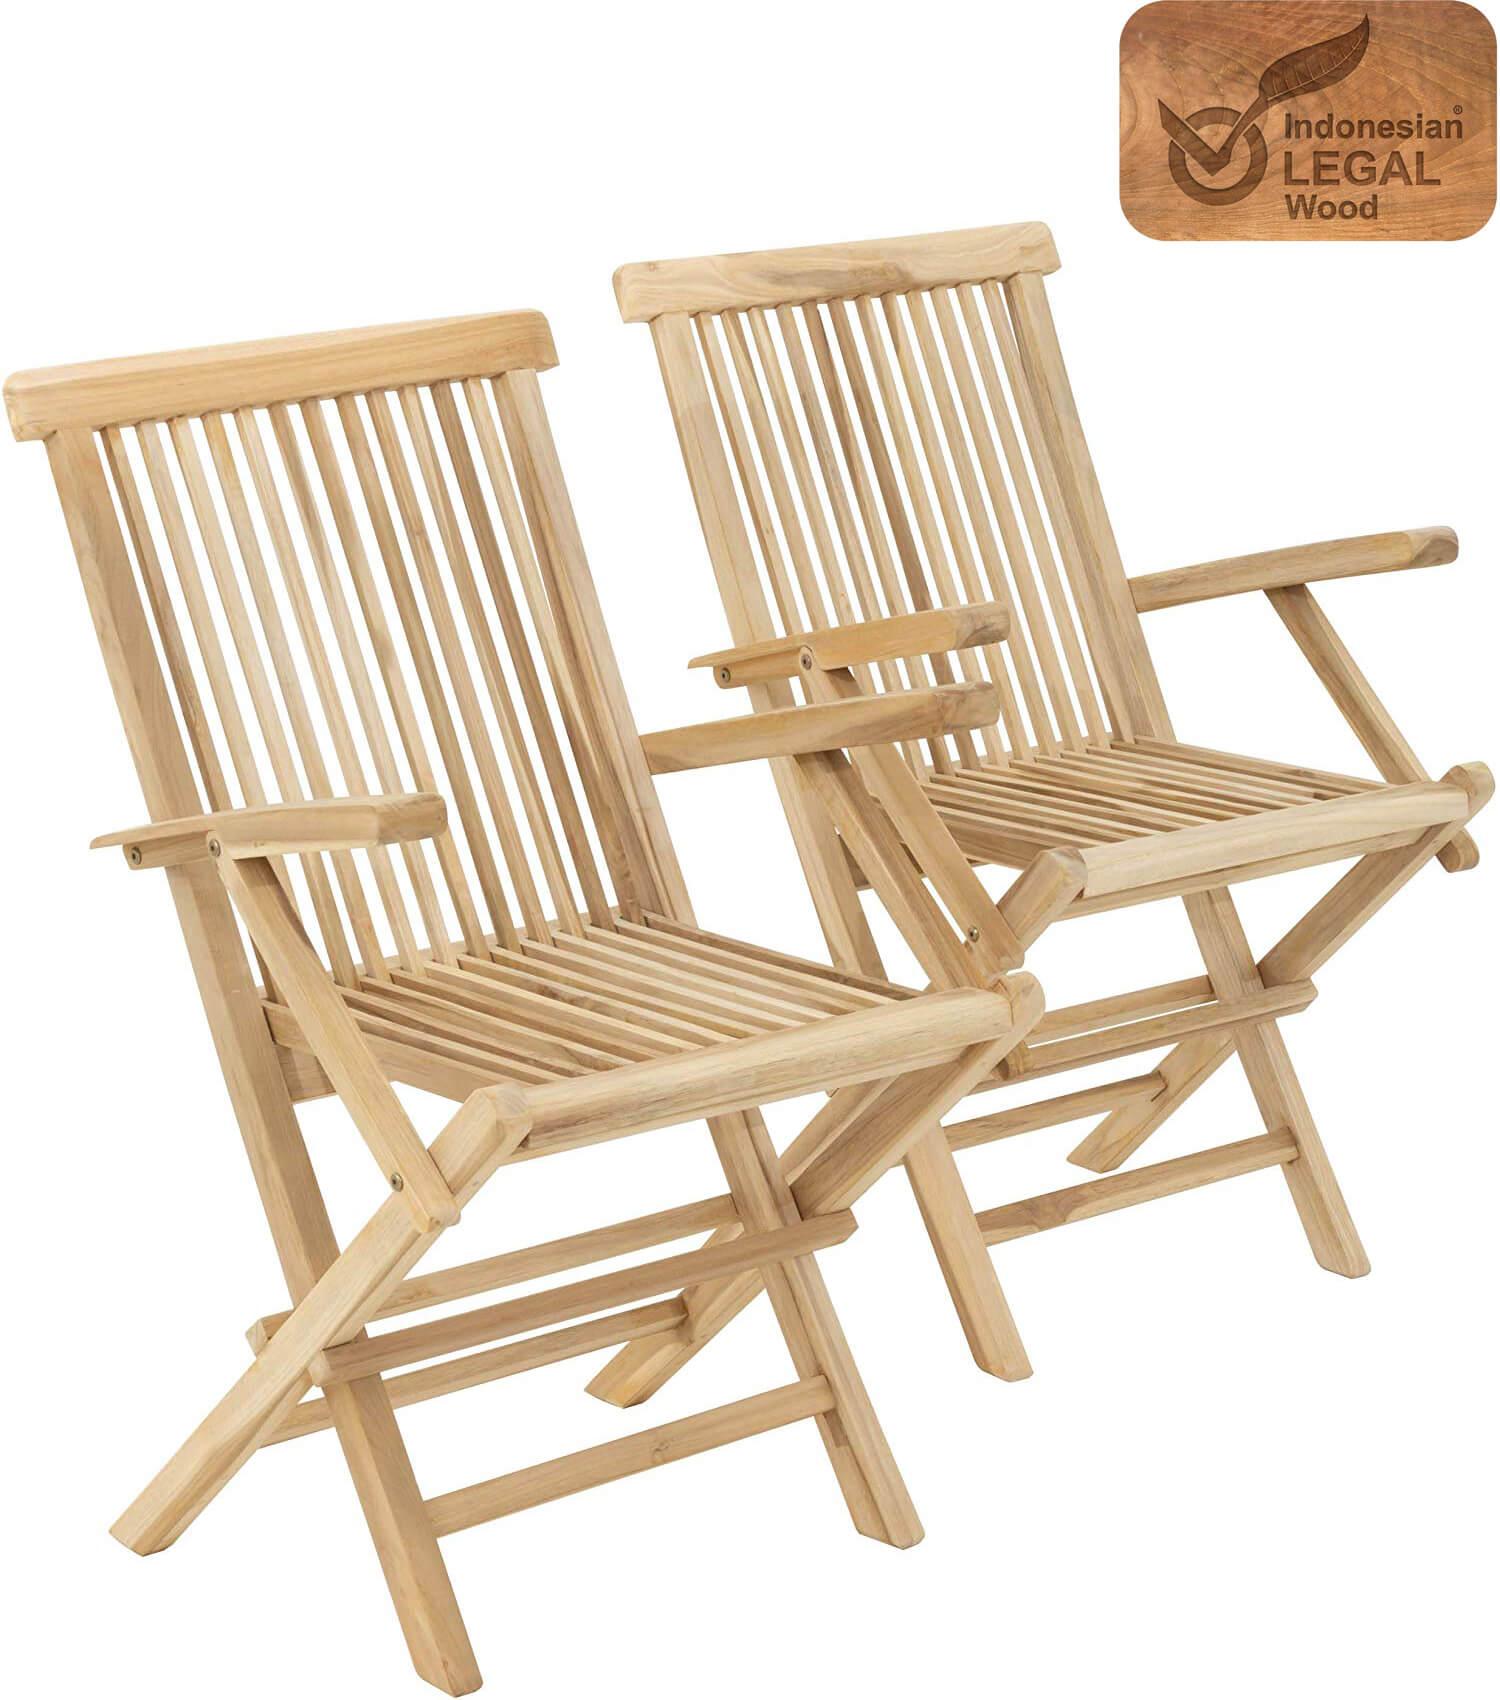 Golden Teak Wood Folding Chair 2pcs Newbuy